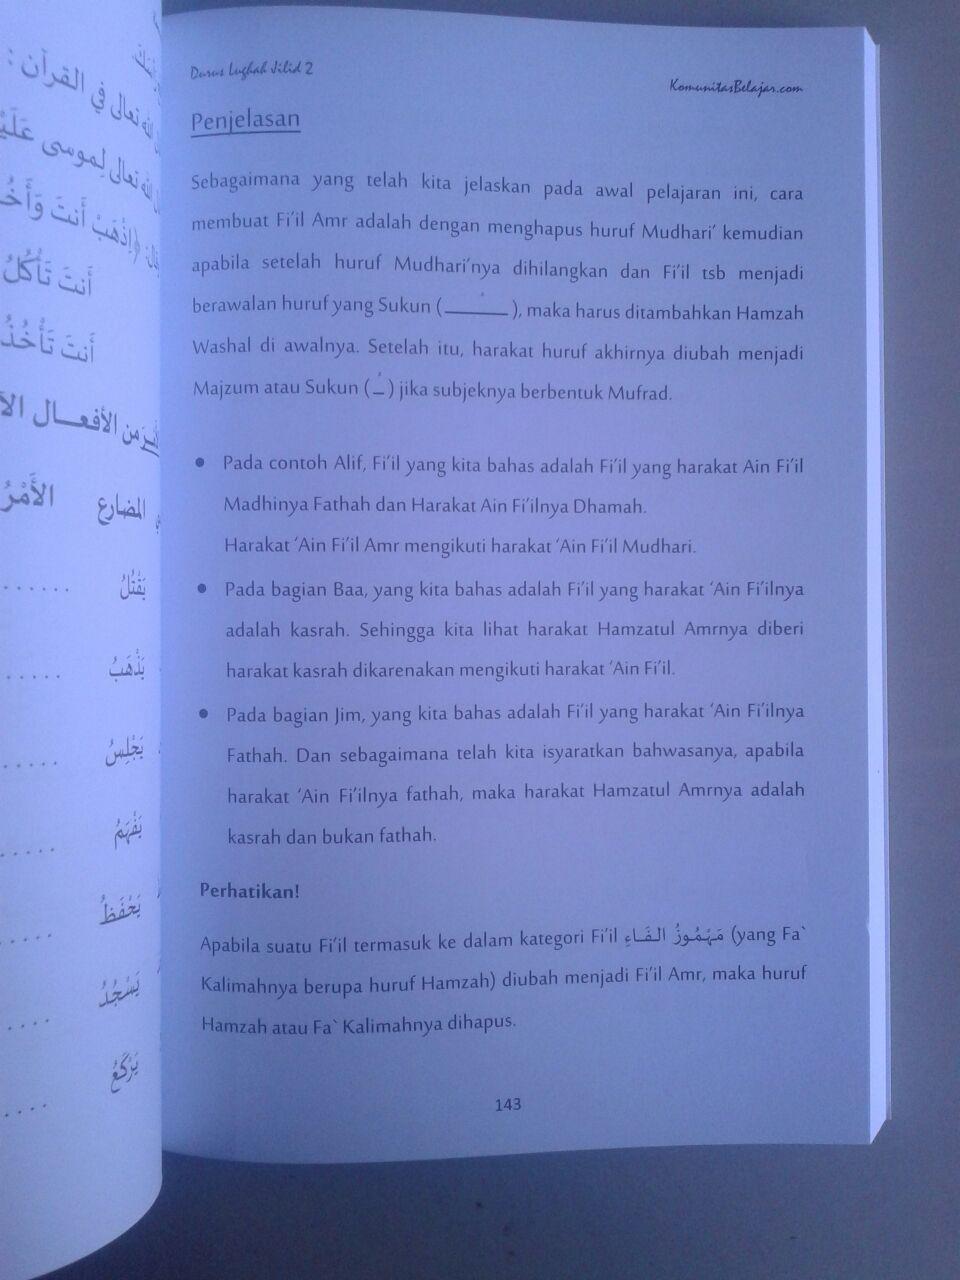 Buku Panduan Durus Lughah 2 Syarah Durusul Lughah isi 2